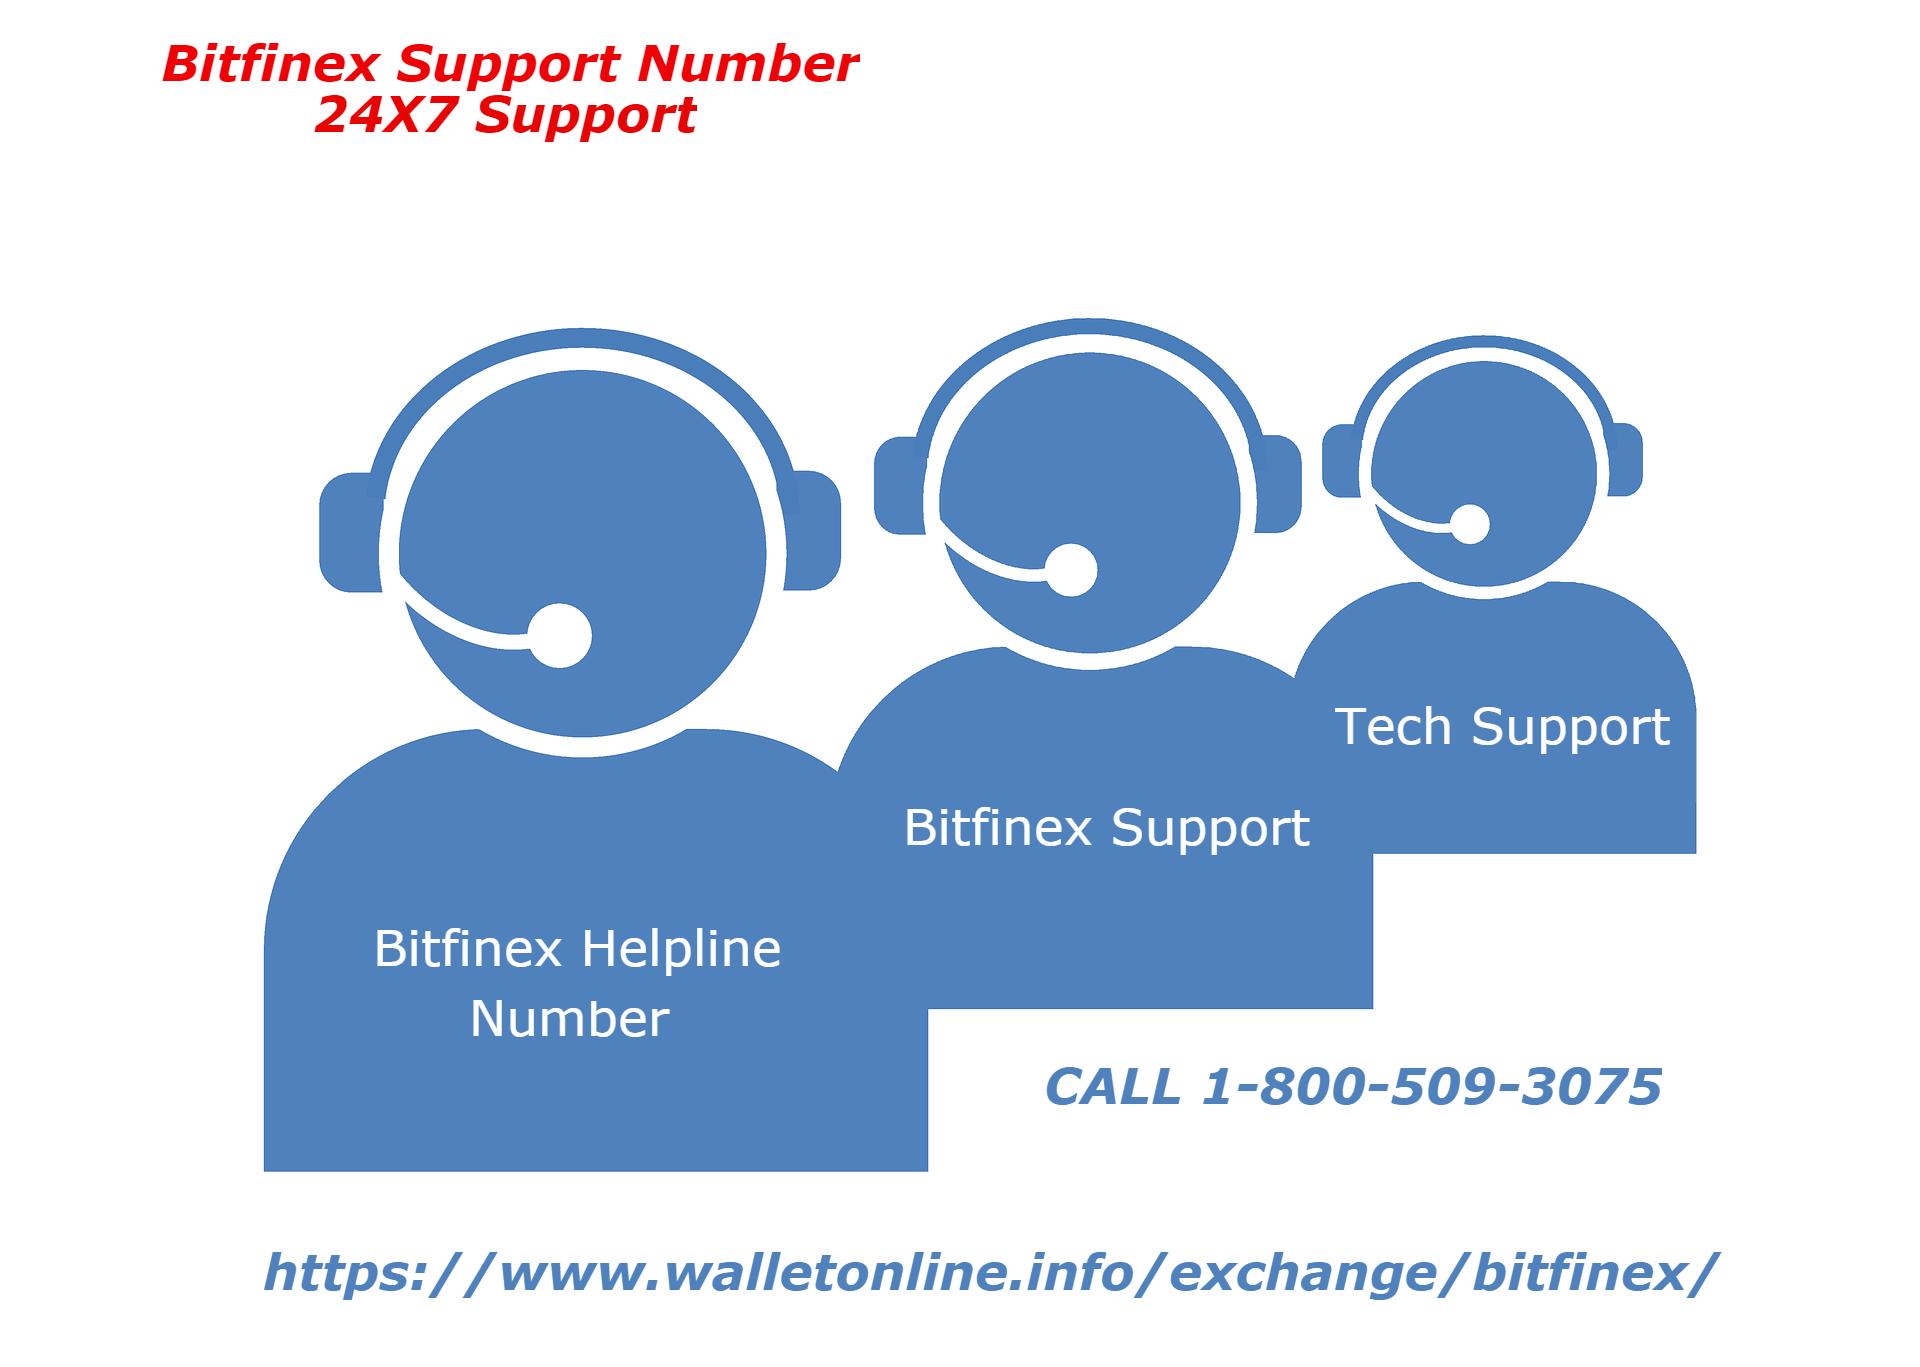 Bitfinex Customer Service 1 800 509 3075 Toll Free Phone Number Hp Printer Printer Driver Best Printers